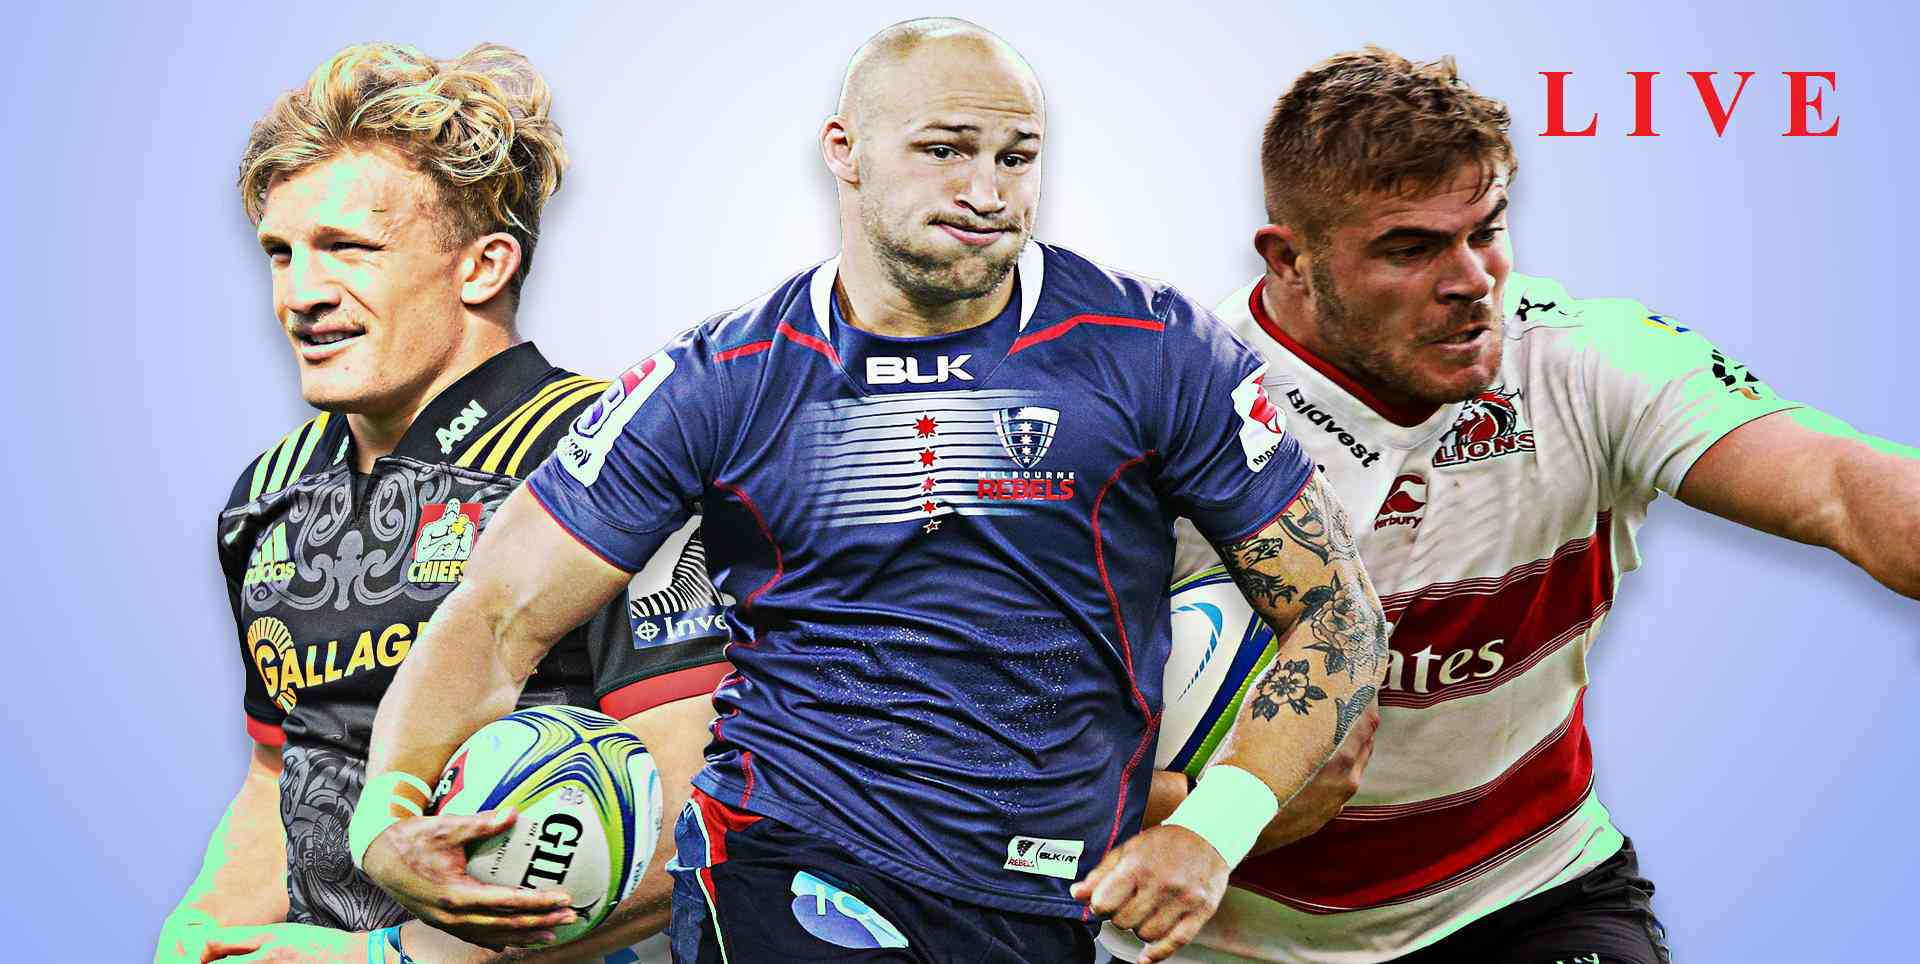 munster-vs-glasgow-warriors-rugby-live